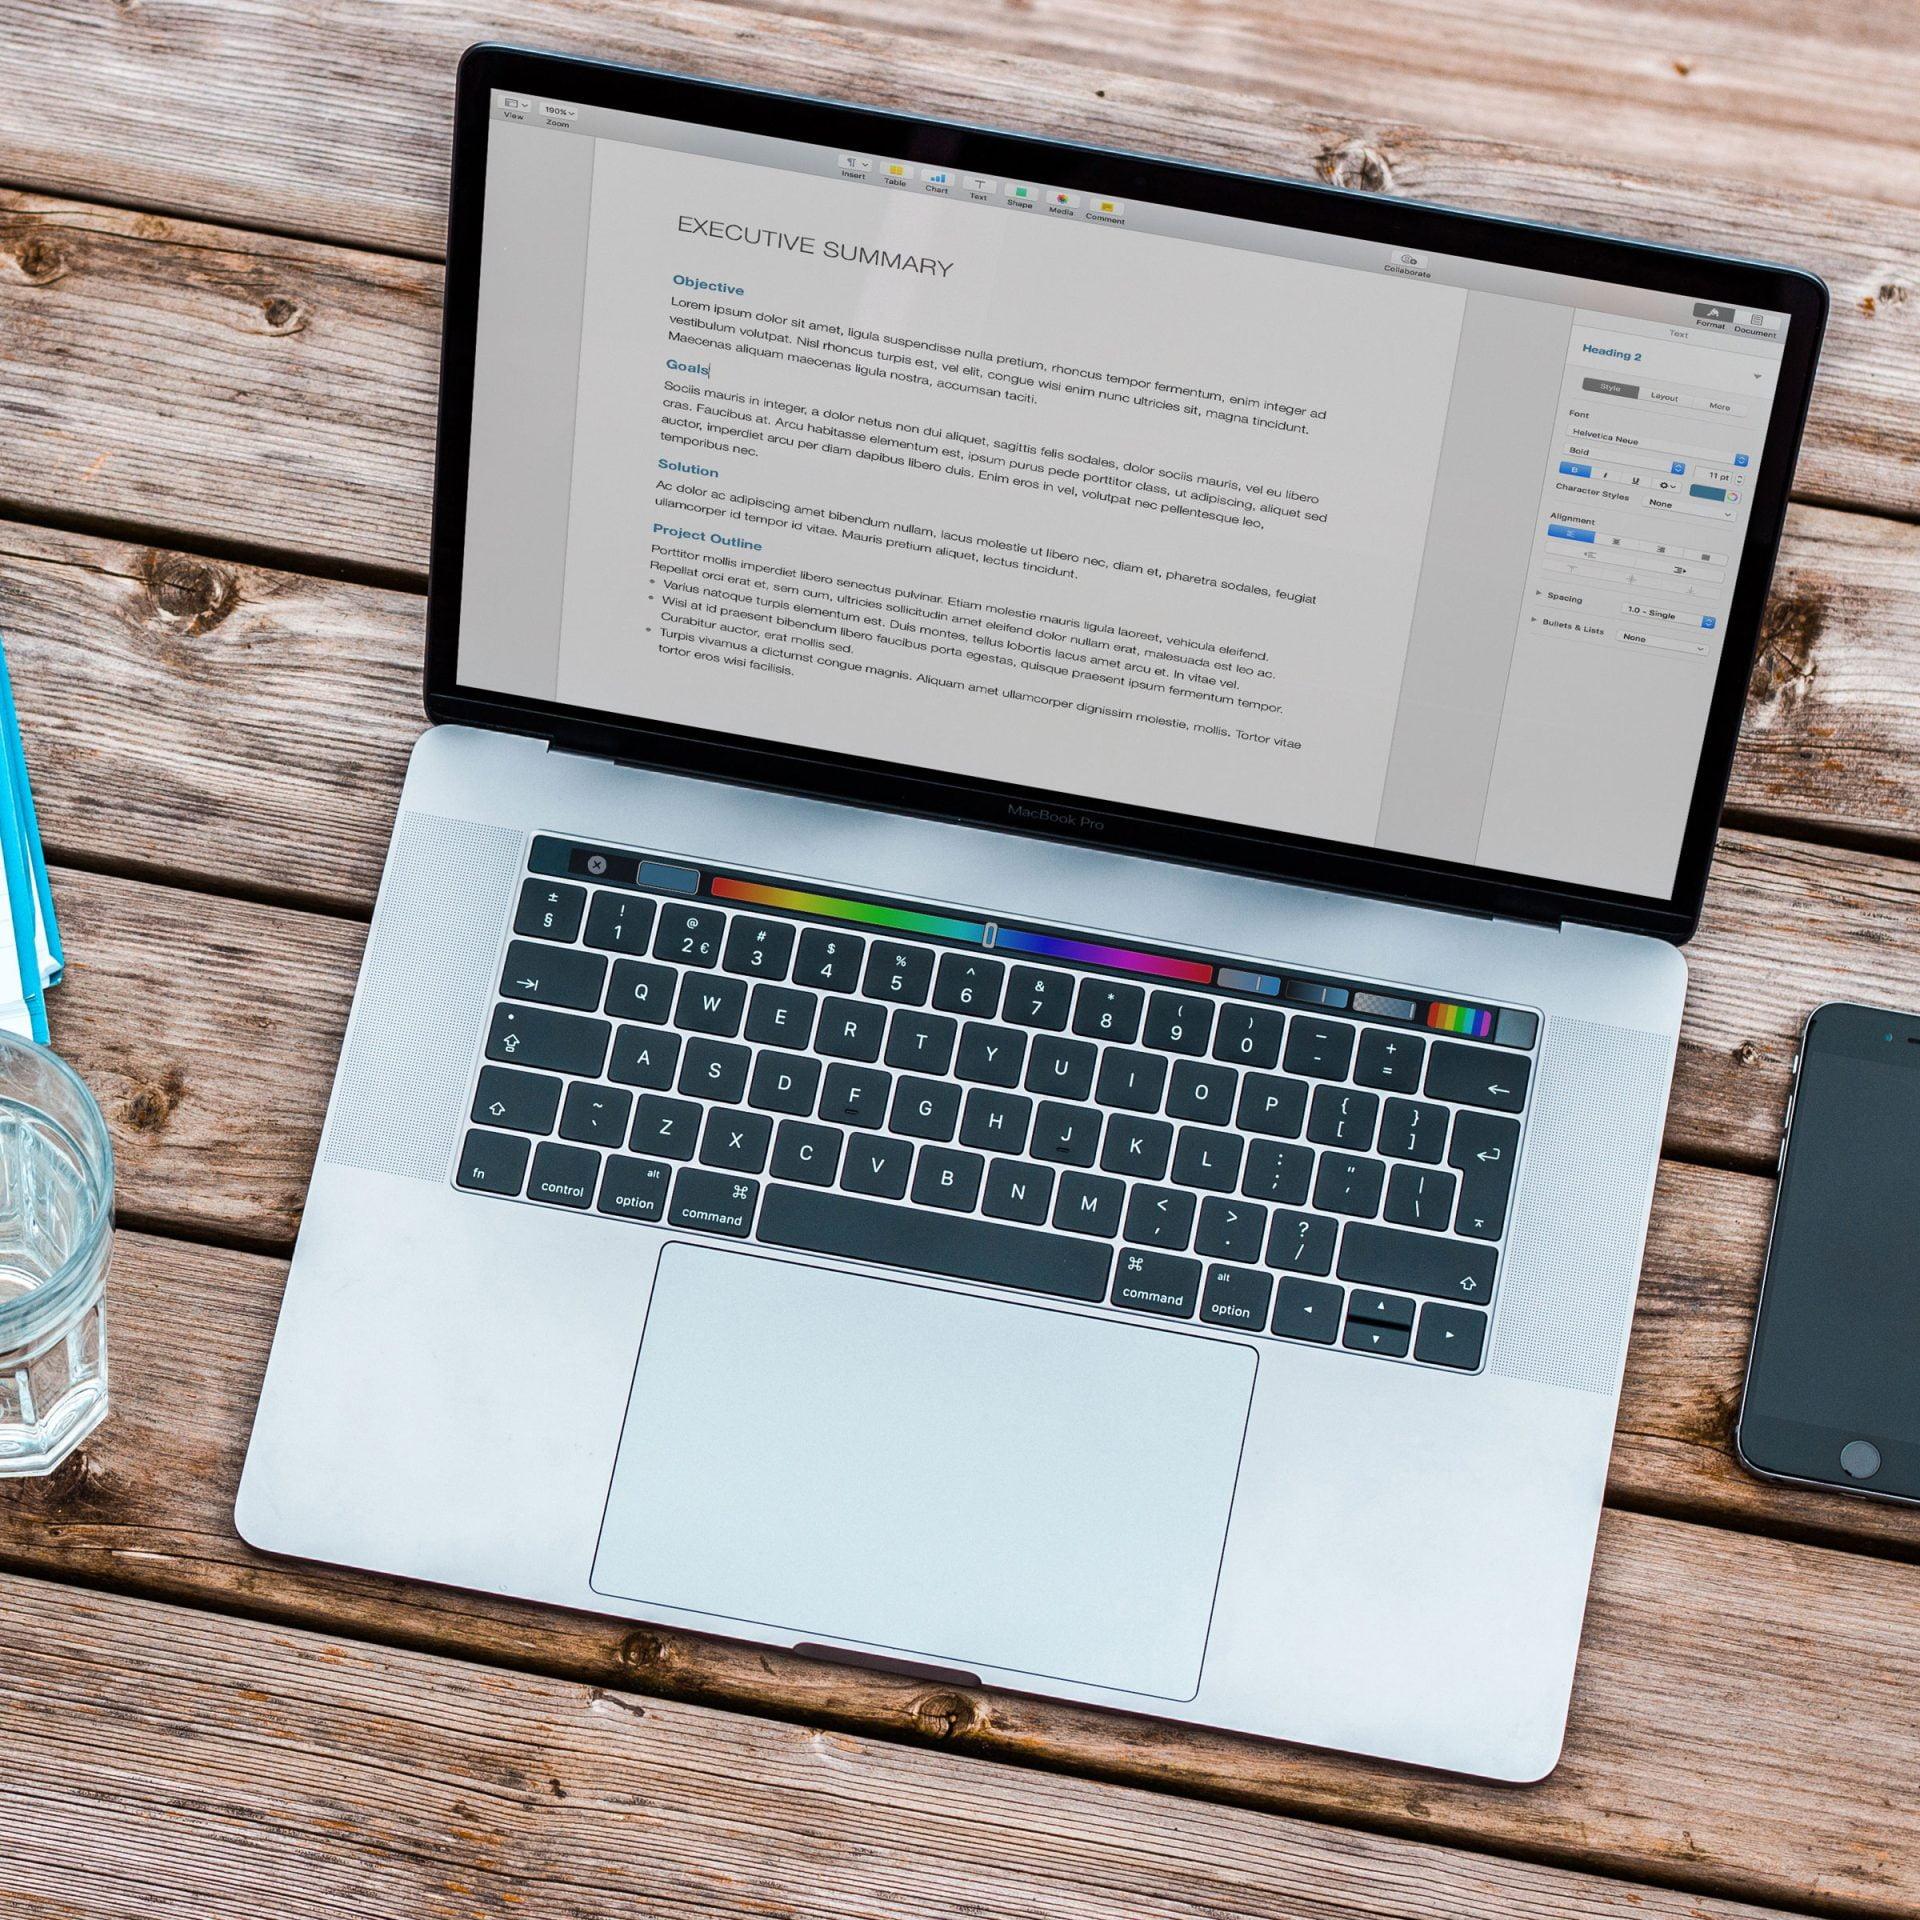 cursus Wordpress thema's bouwen: laptop, glas water en telefoon